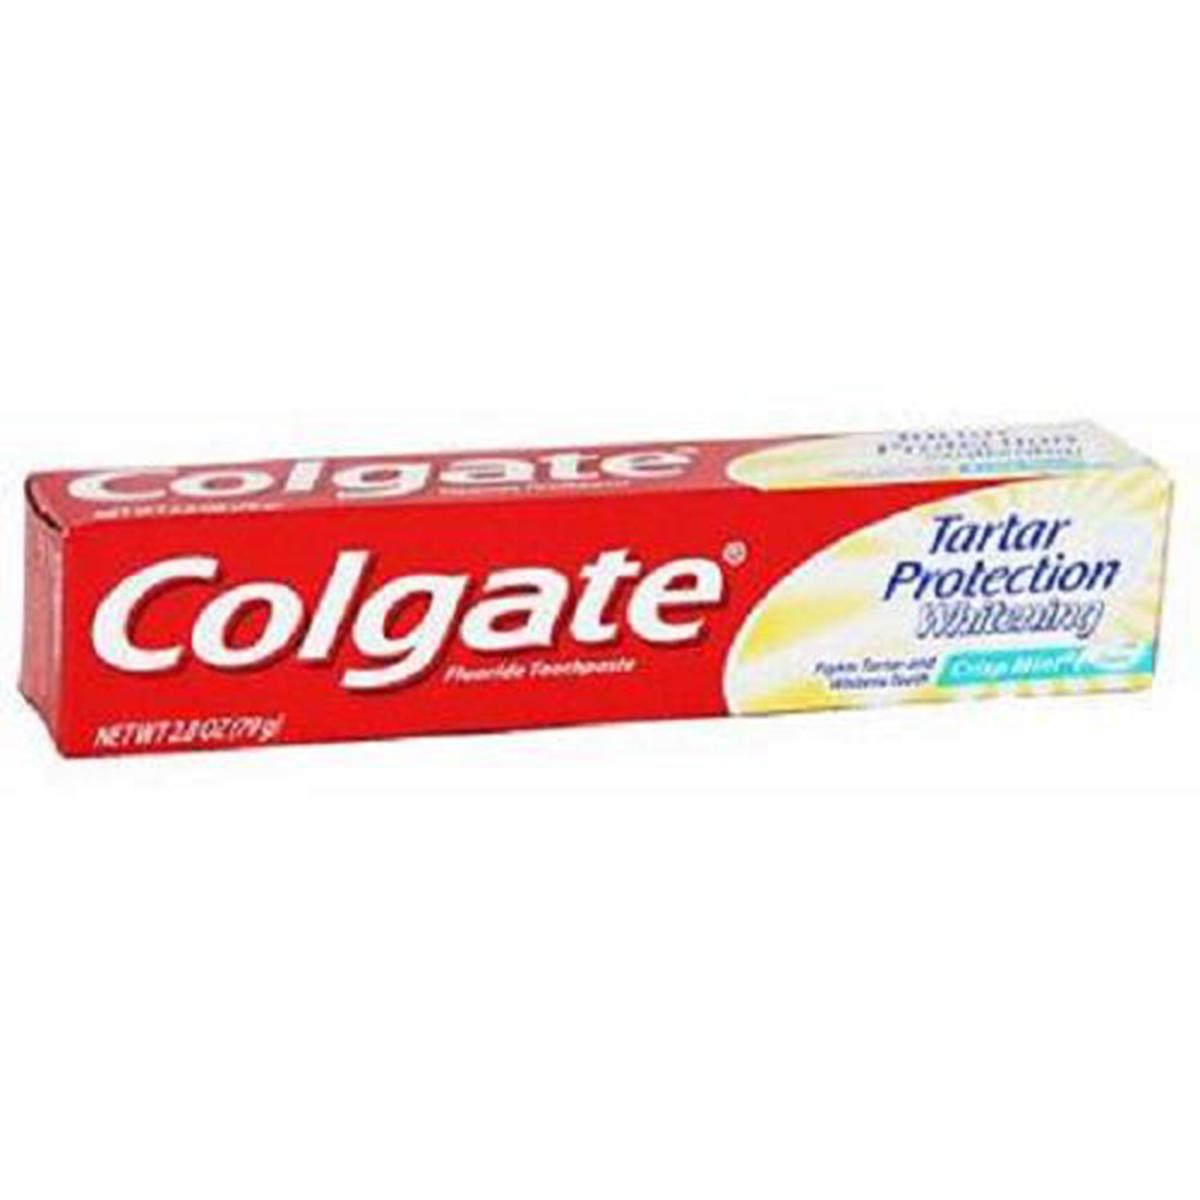 COLGATE TARTAR PROTECTION TOOTH PASTE 2.8 oz